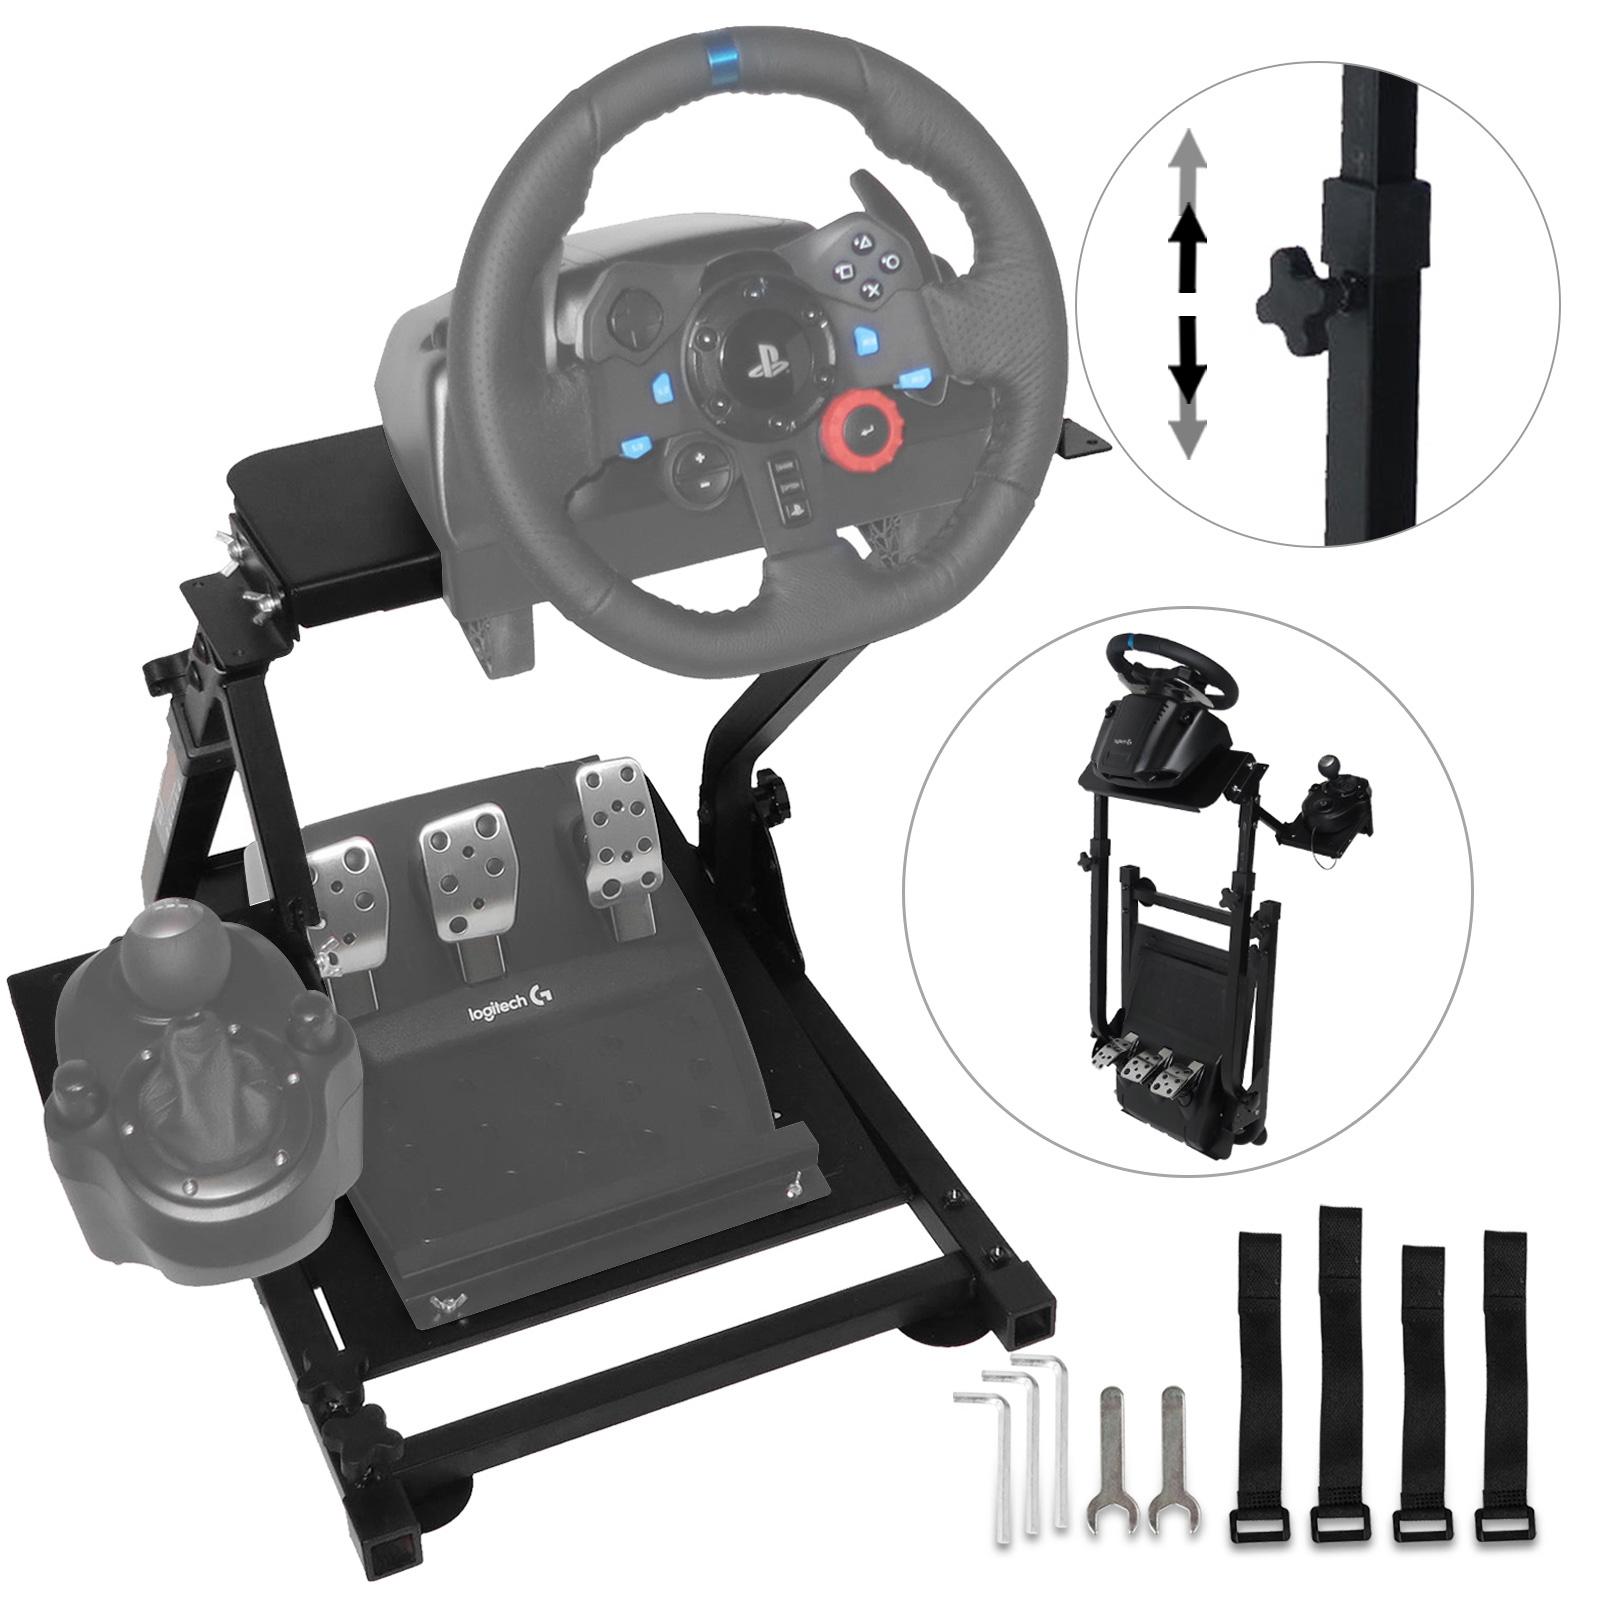 RACING VOLANTE SOPORTE para Logitech G29 feel applicable Wheel Platform